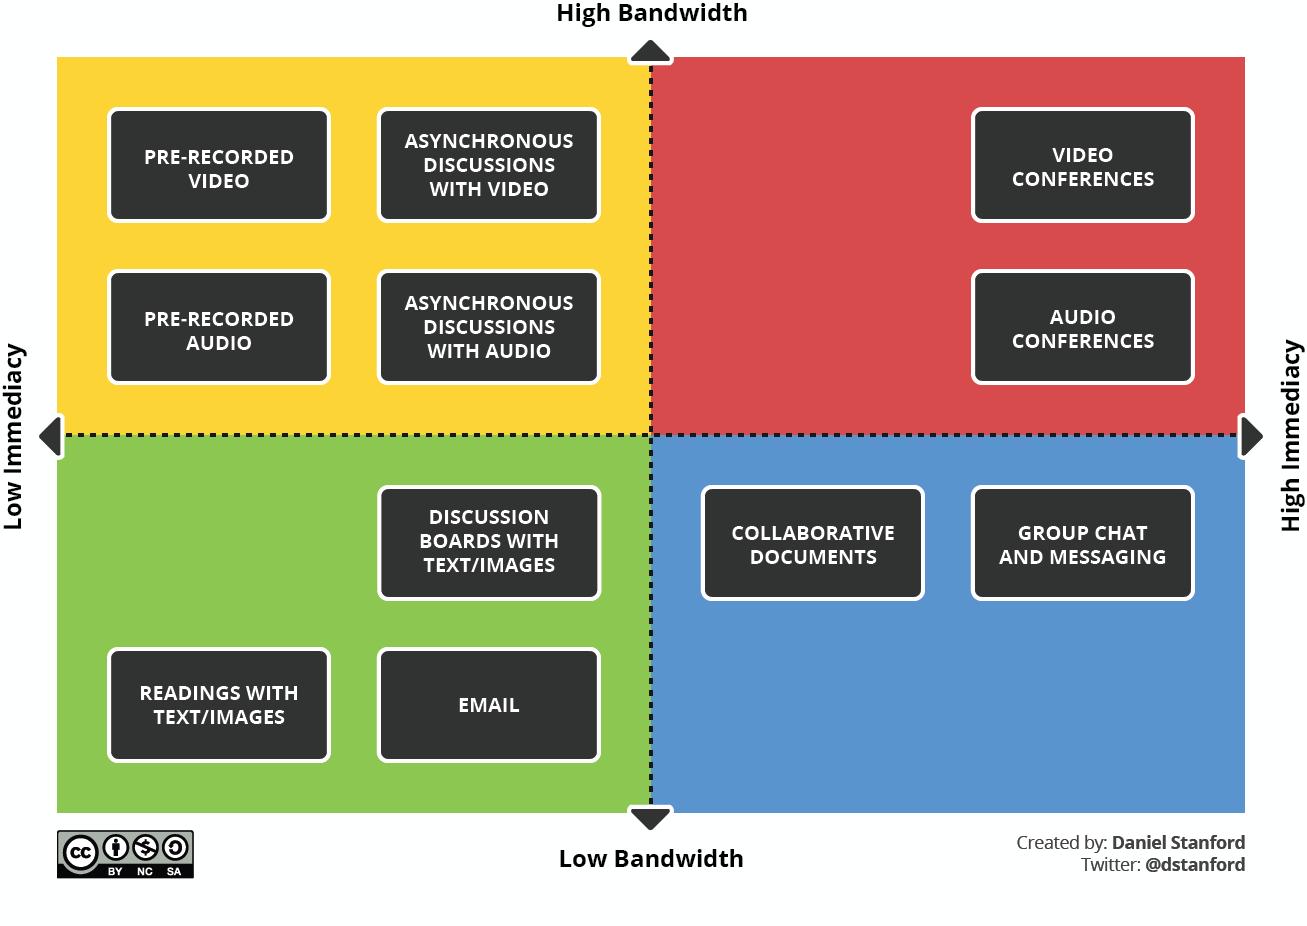 bandwidth-immediacy-matrix-by-Daniel-Stanford